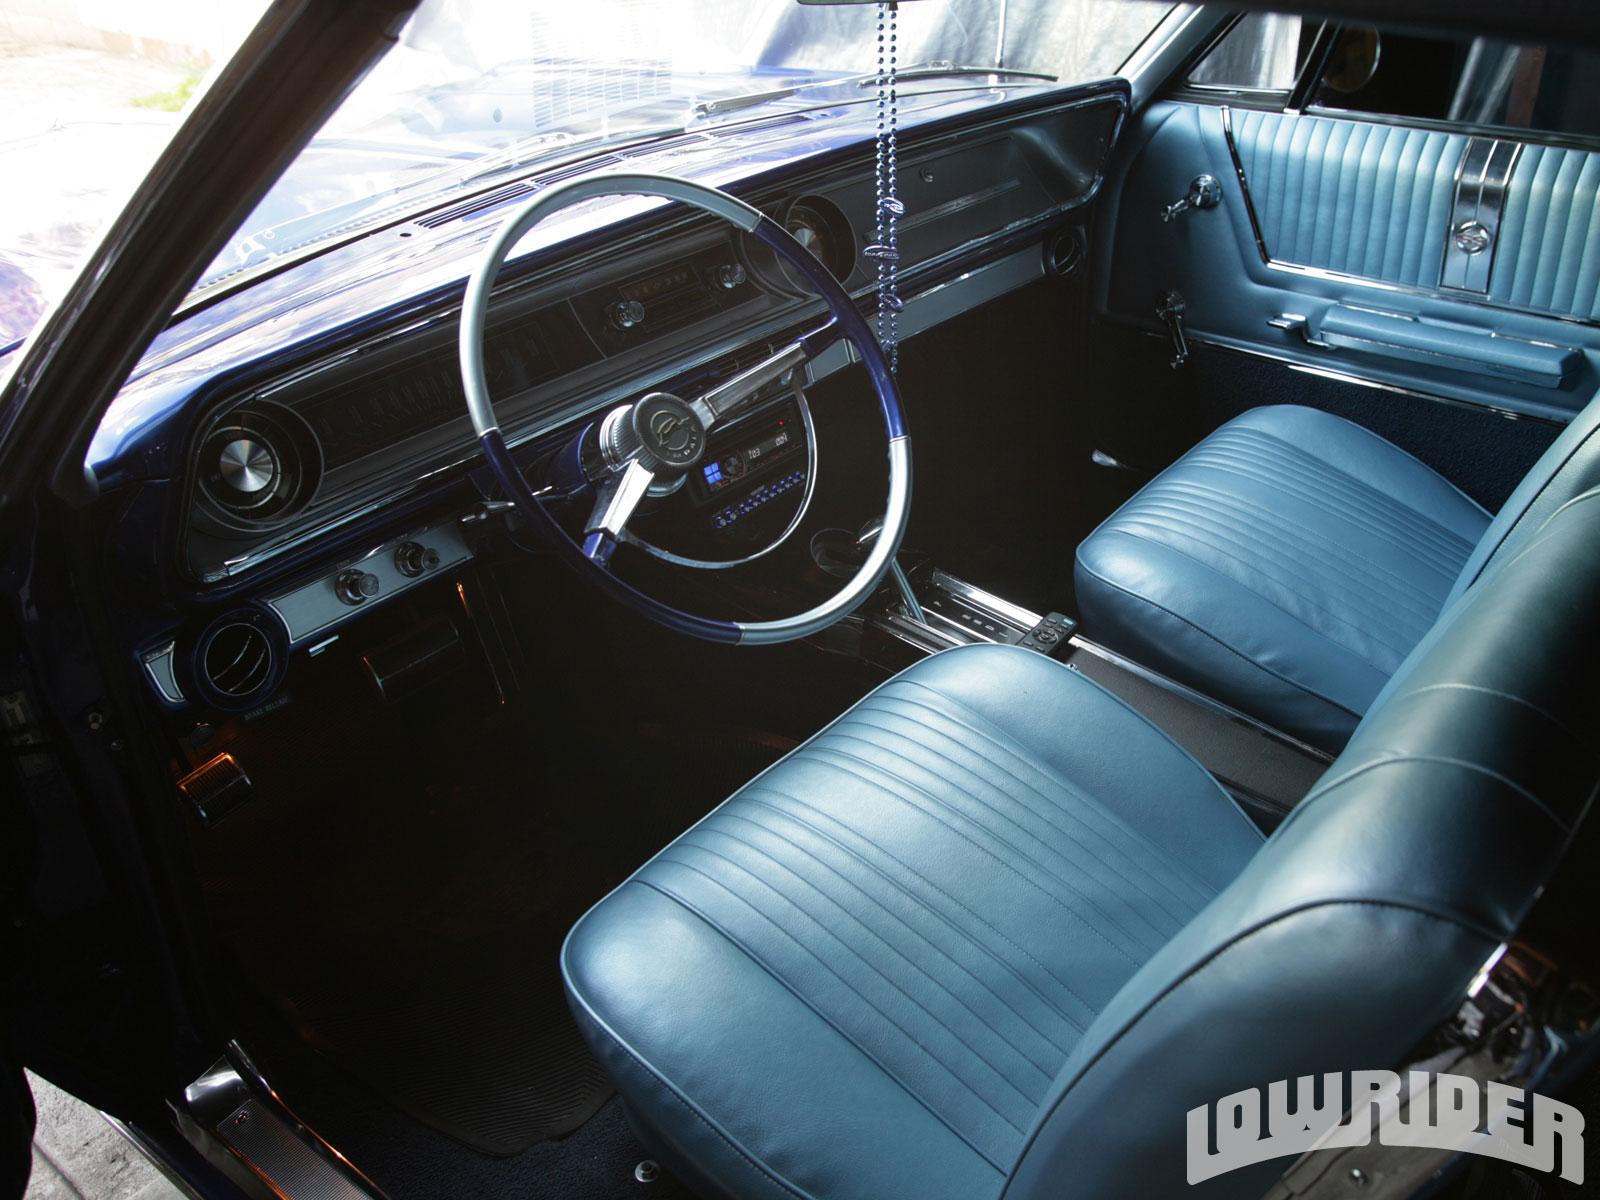 1965 Chevrolet Impala Lowrider Magazine Wiring Harness 16 20